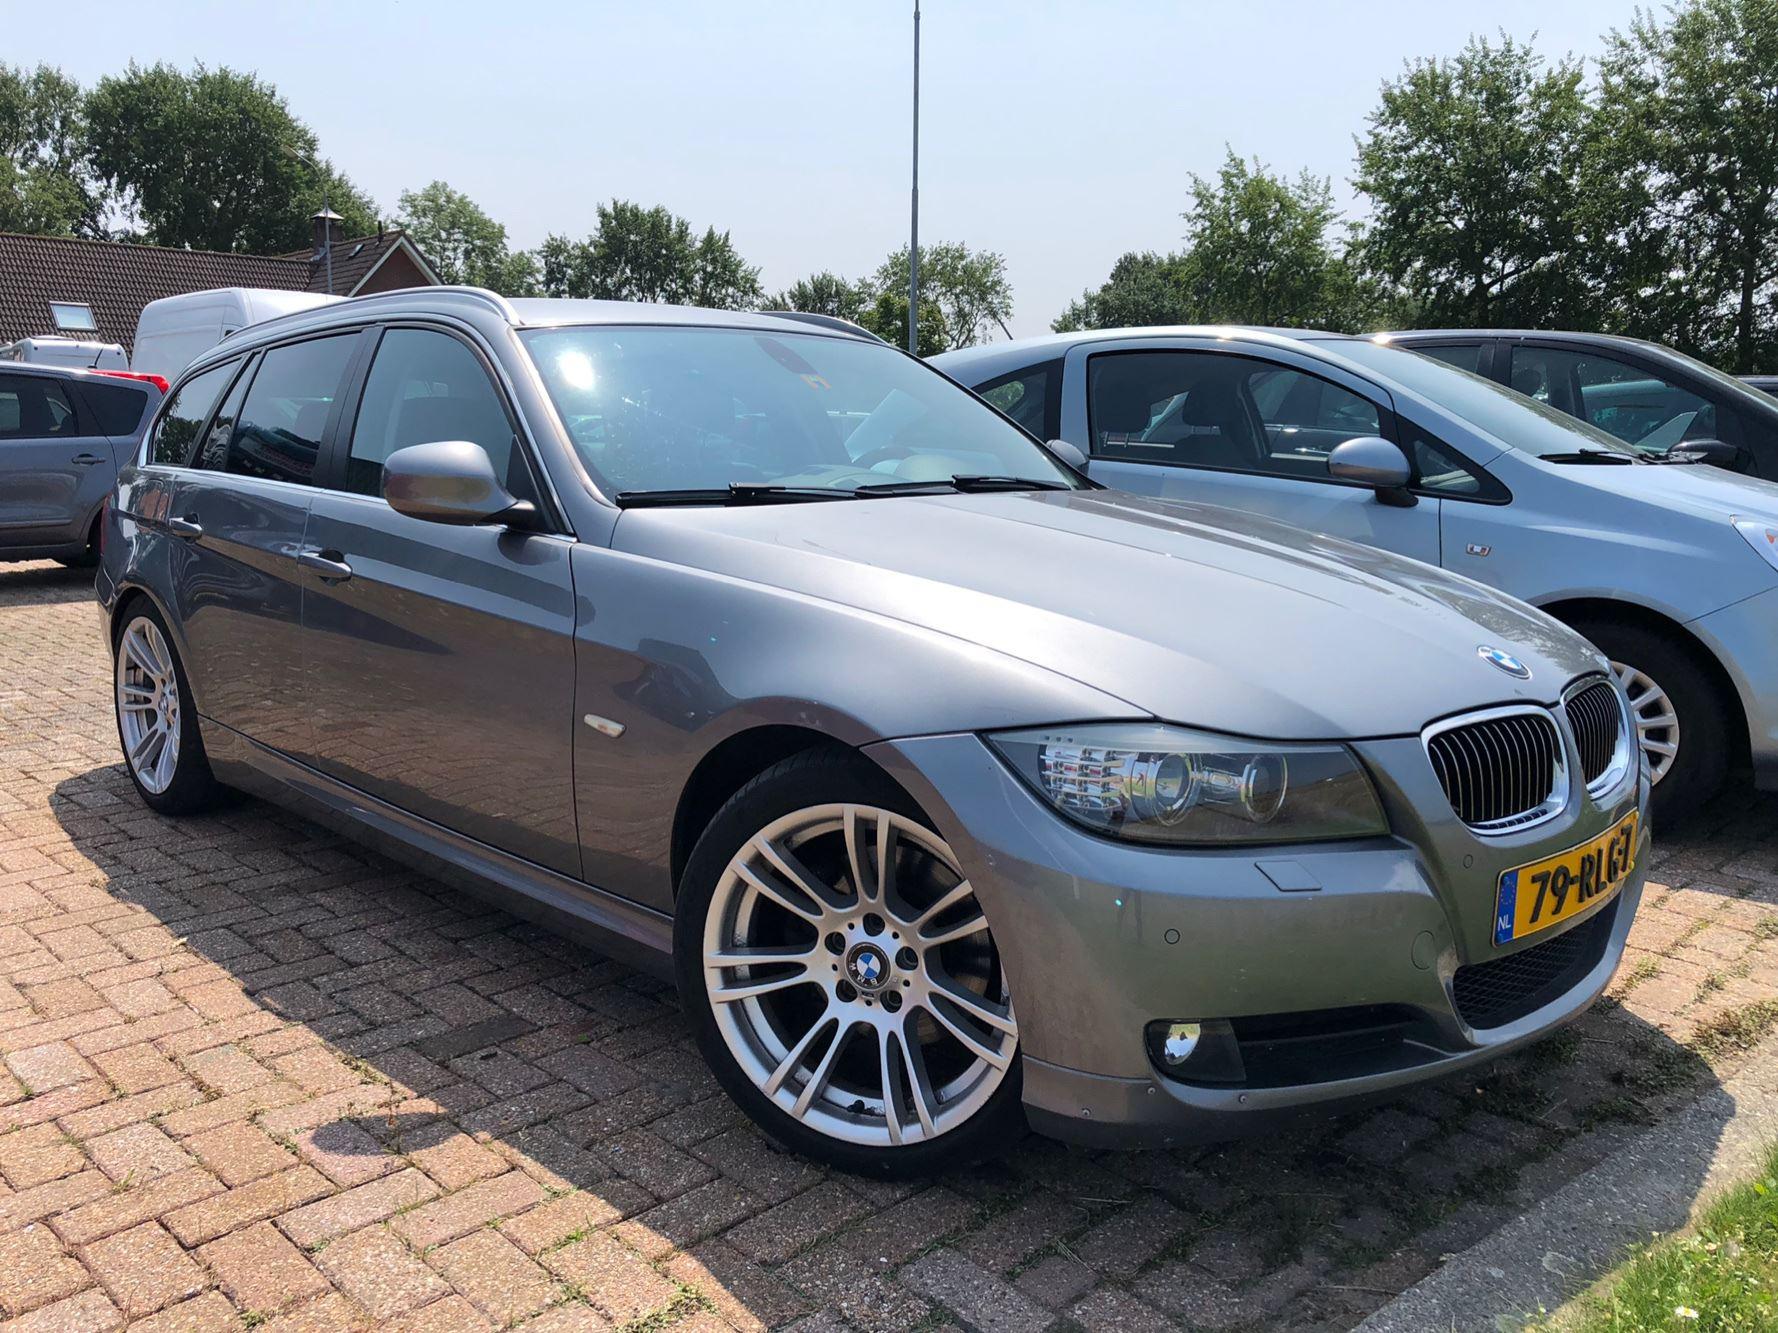 BMW 3-serie Touring occasion - Autobedrijf Jan Wisse